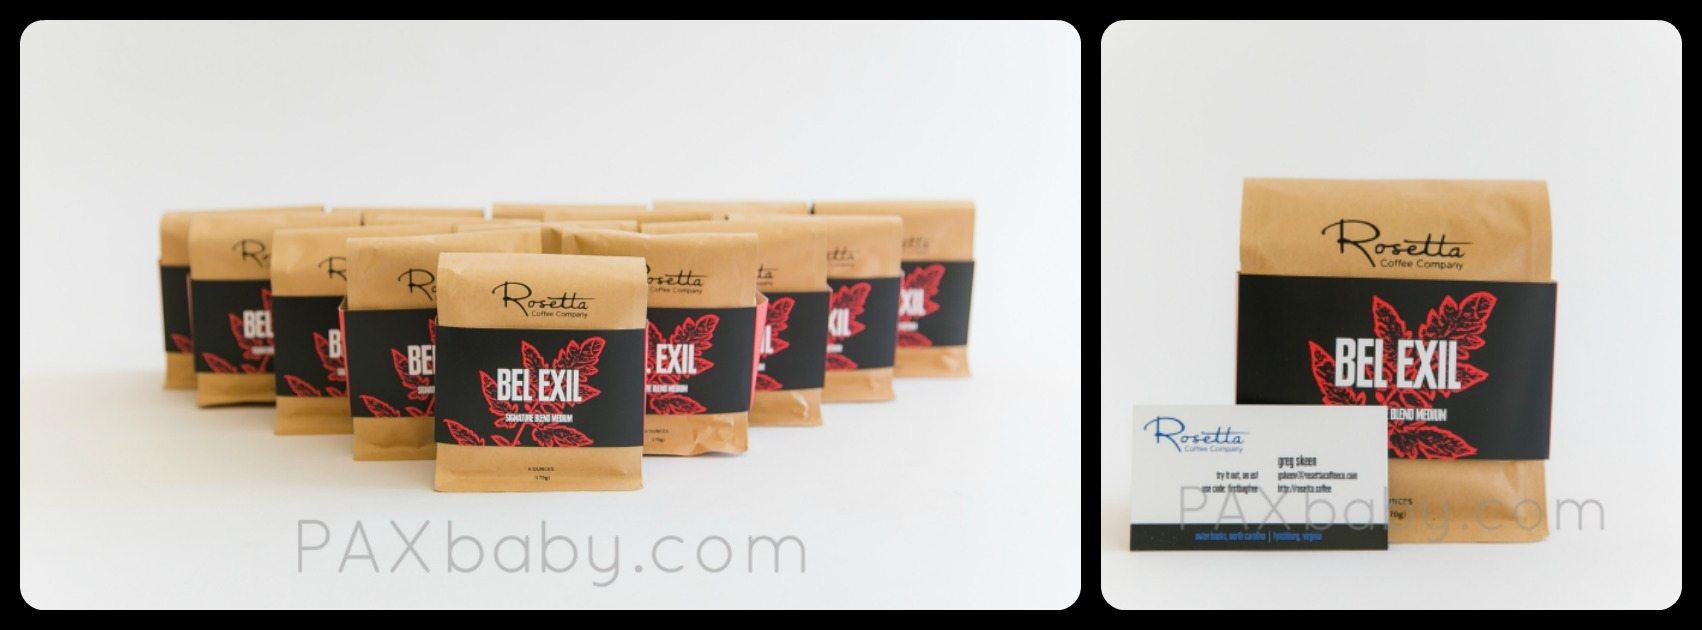 paxbaby_rosetta-coffee-company_coffee_paxretreat2016